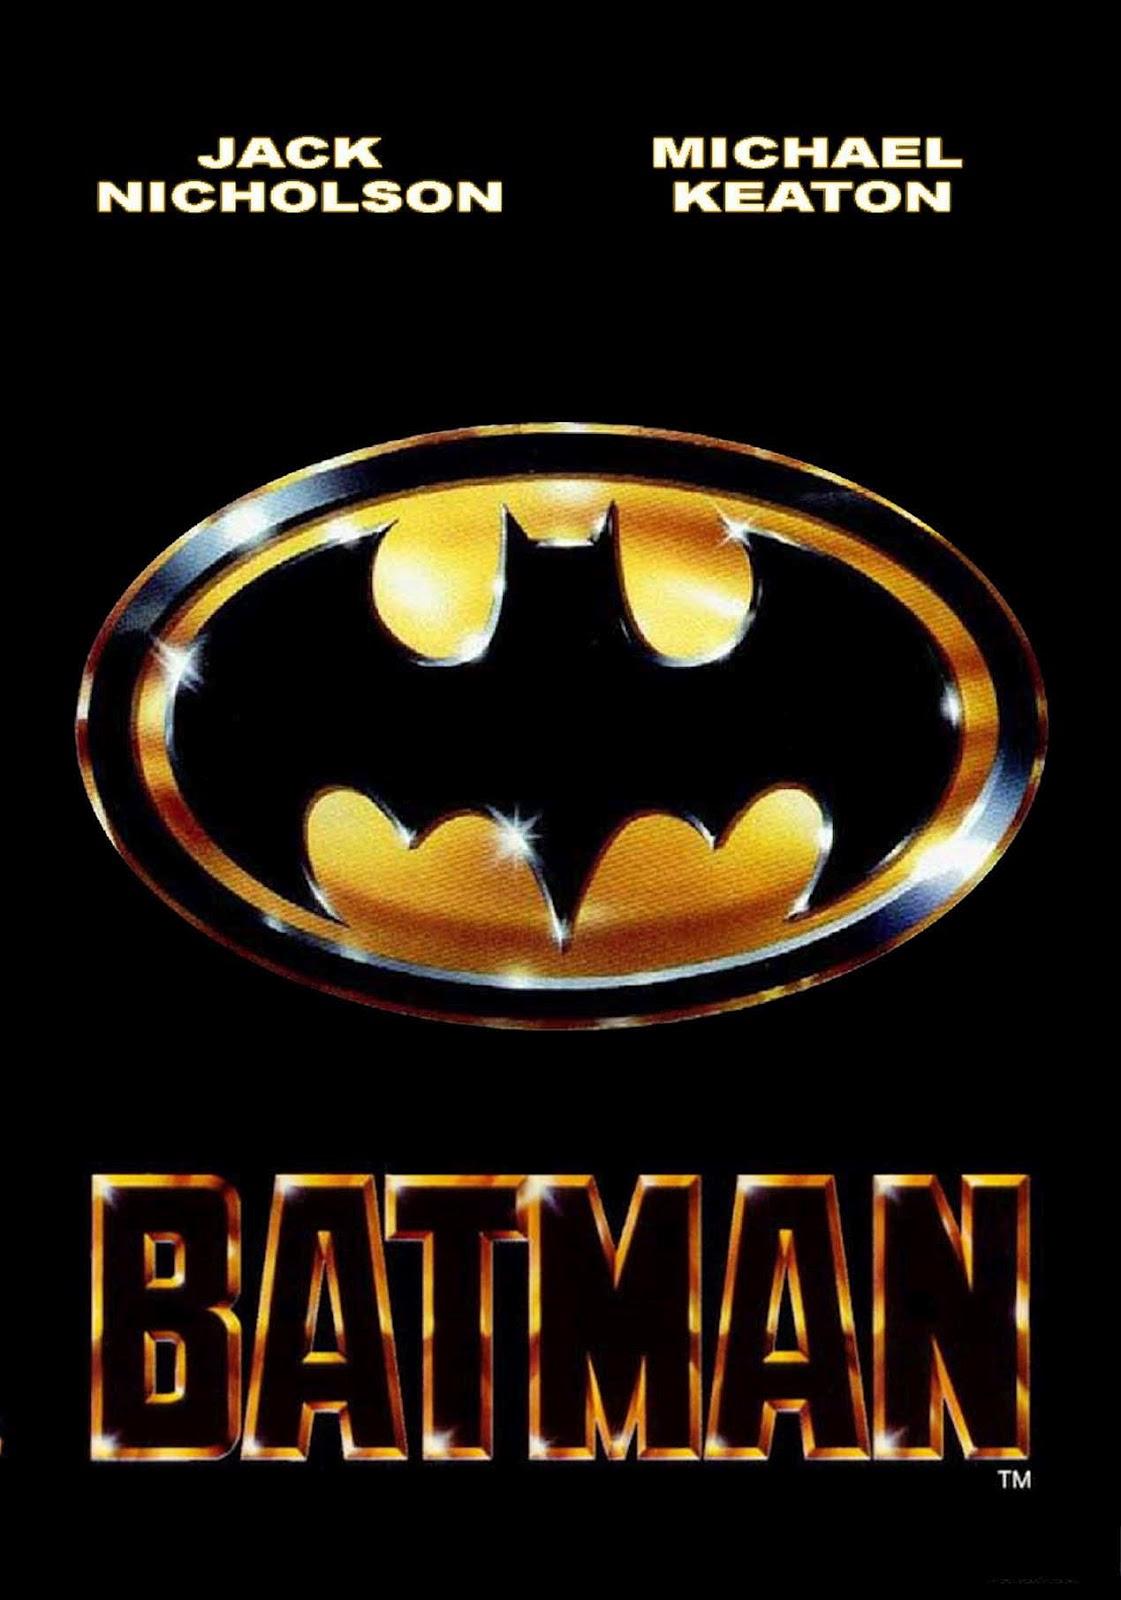 http://2.bp.blogspot.com/-8OyeI1btA2w/UBMLm8KrE6I/AAAAAAAABXA/HdmYKL75zLY/s1600/Batman+(1989).jpg